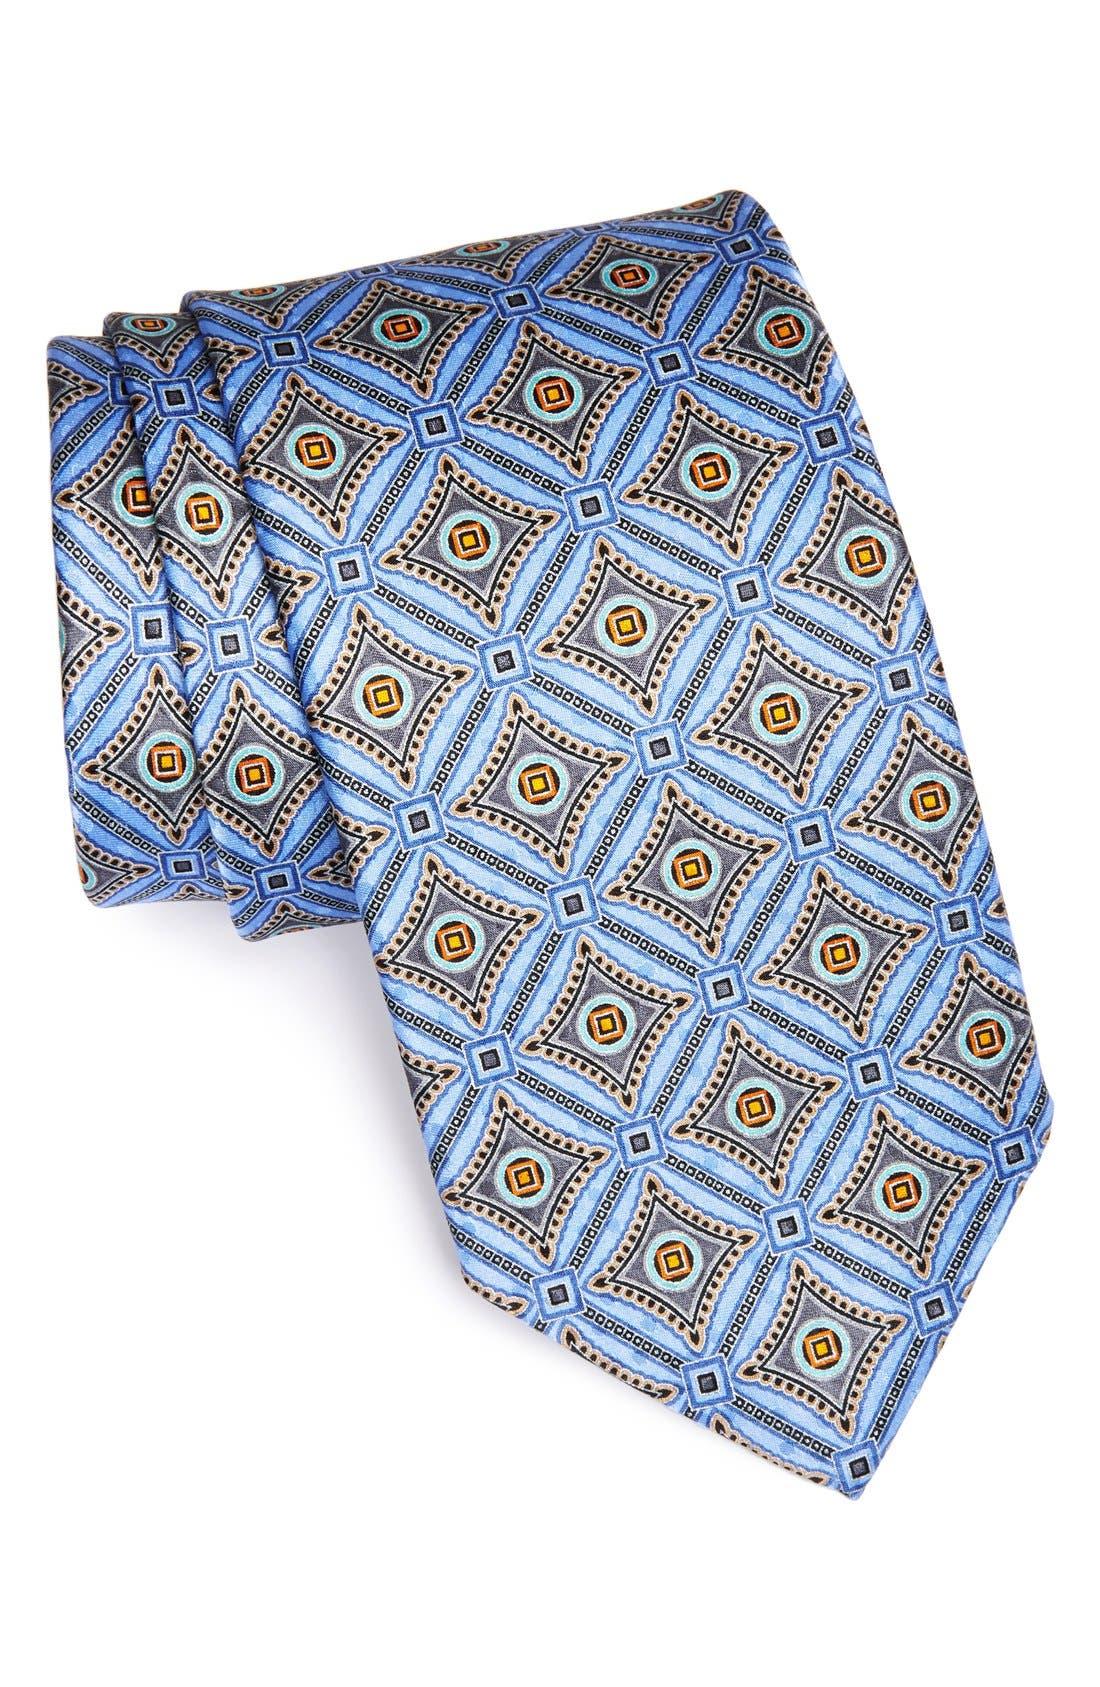 Alternate Image 1 Selected - J.Z. Richards Printed Silk Tie